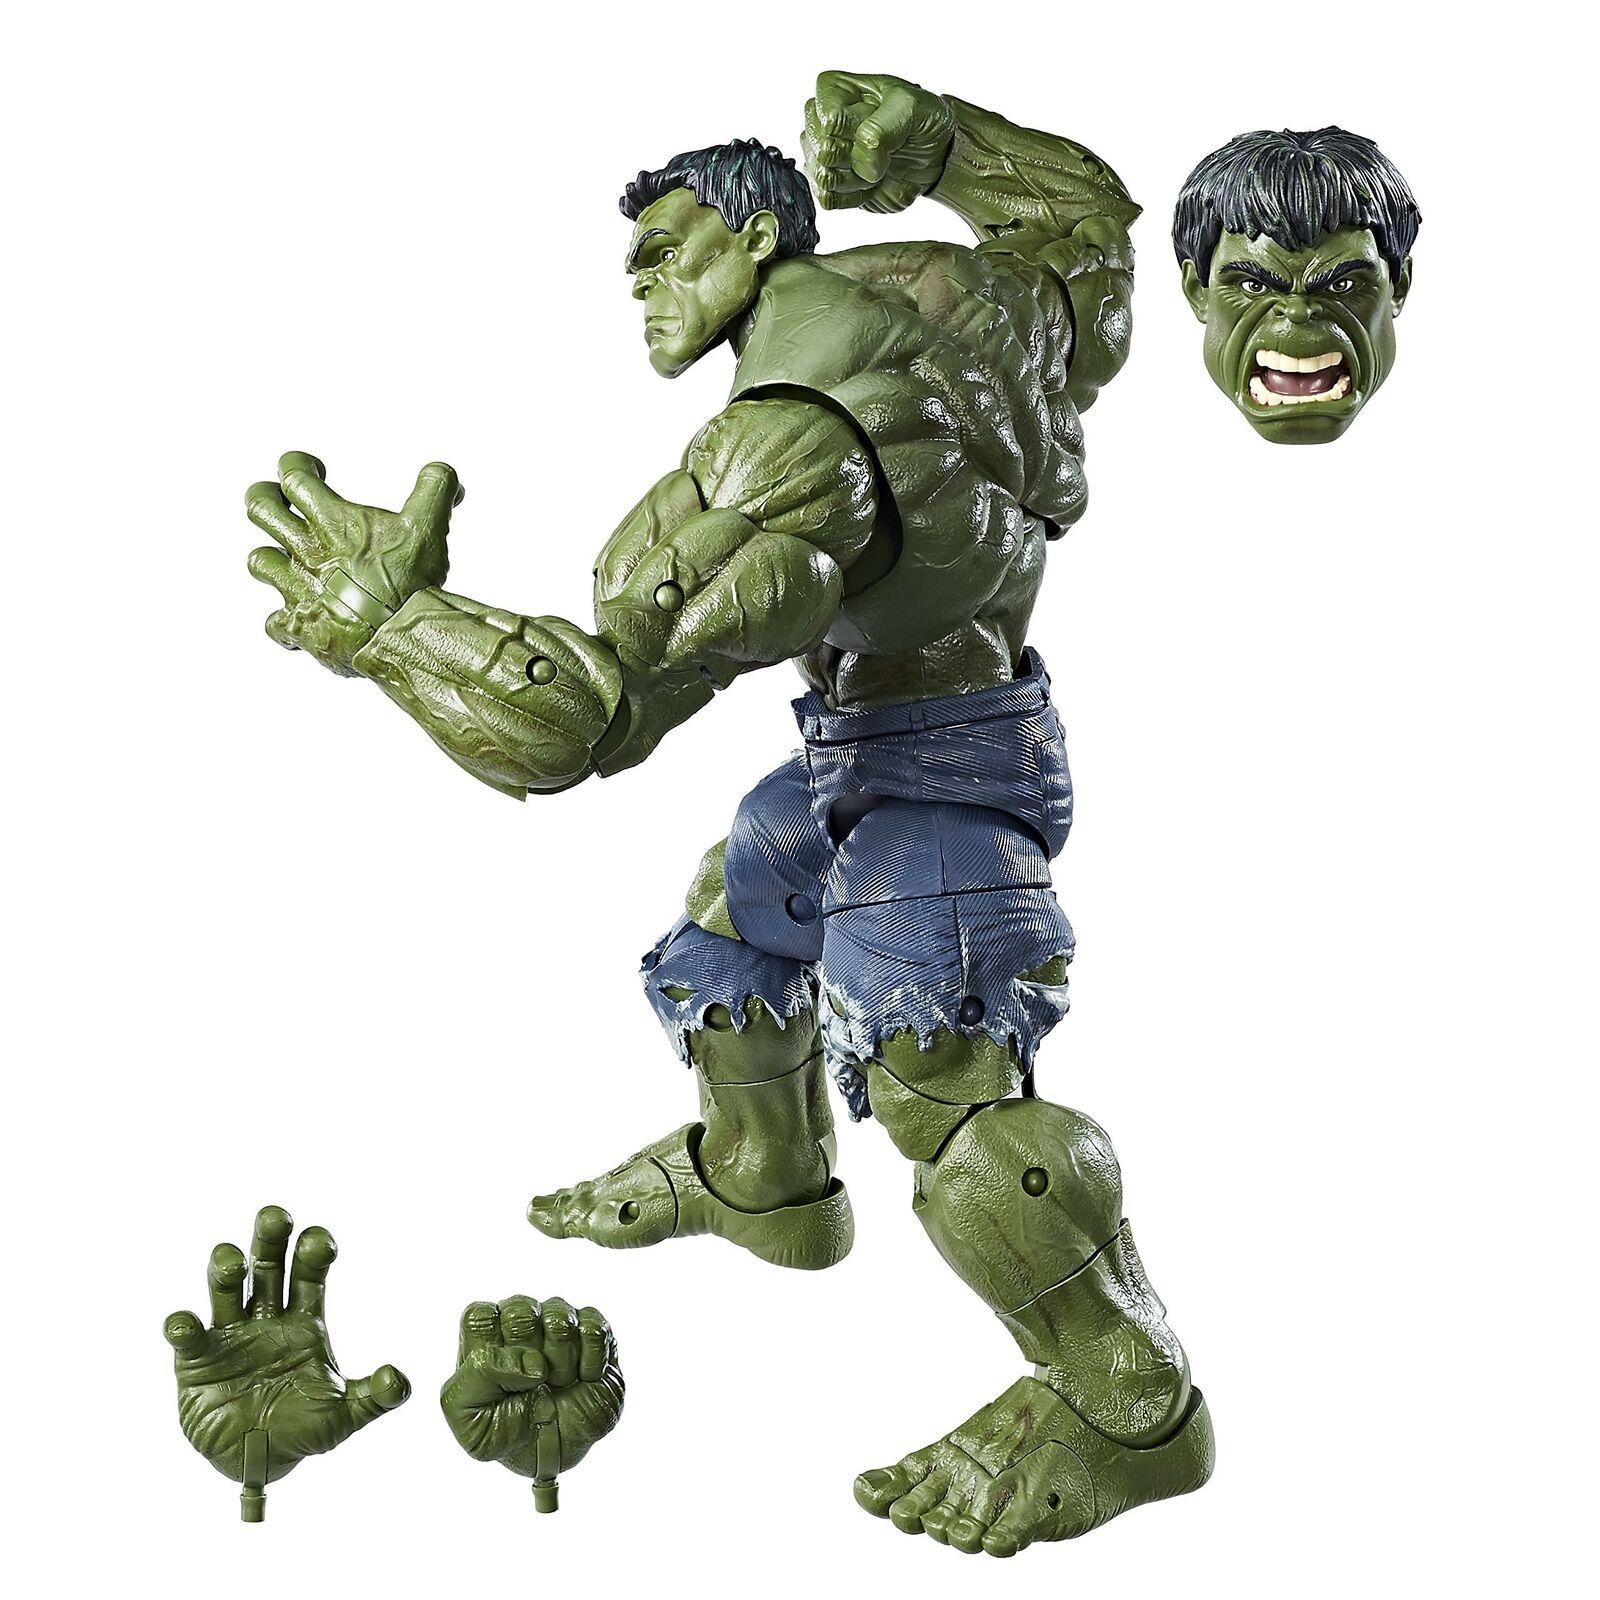 The Avengers C1880EU40 Marvel Legends serie Hulk Figure